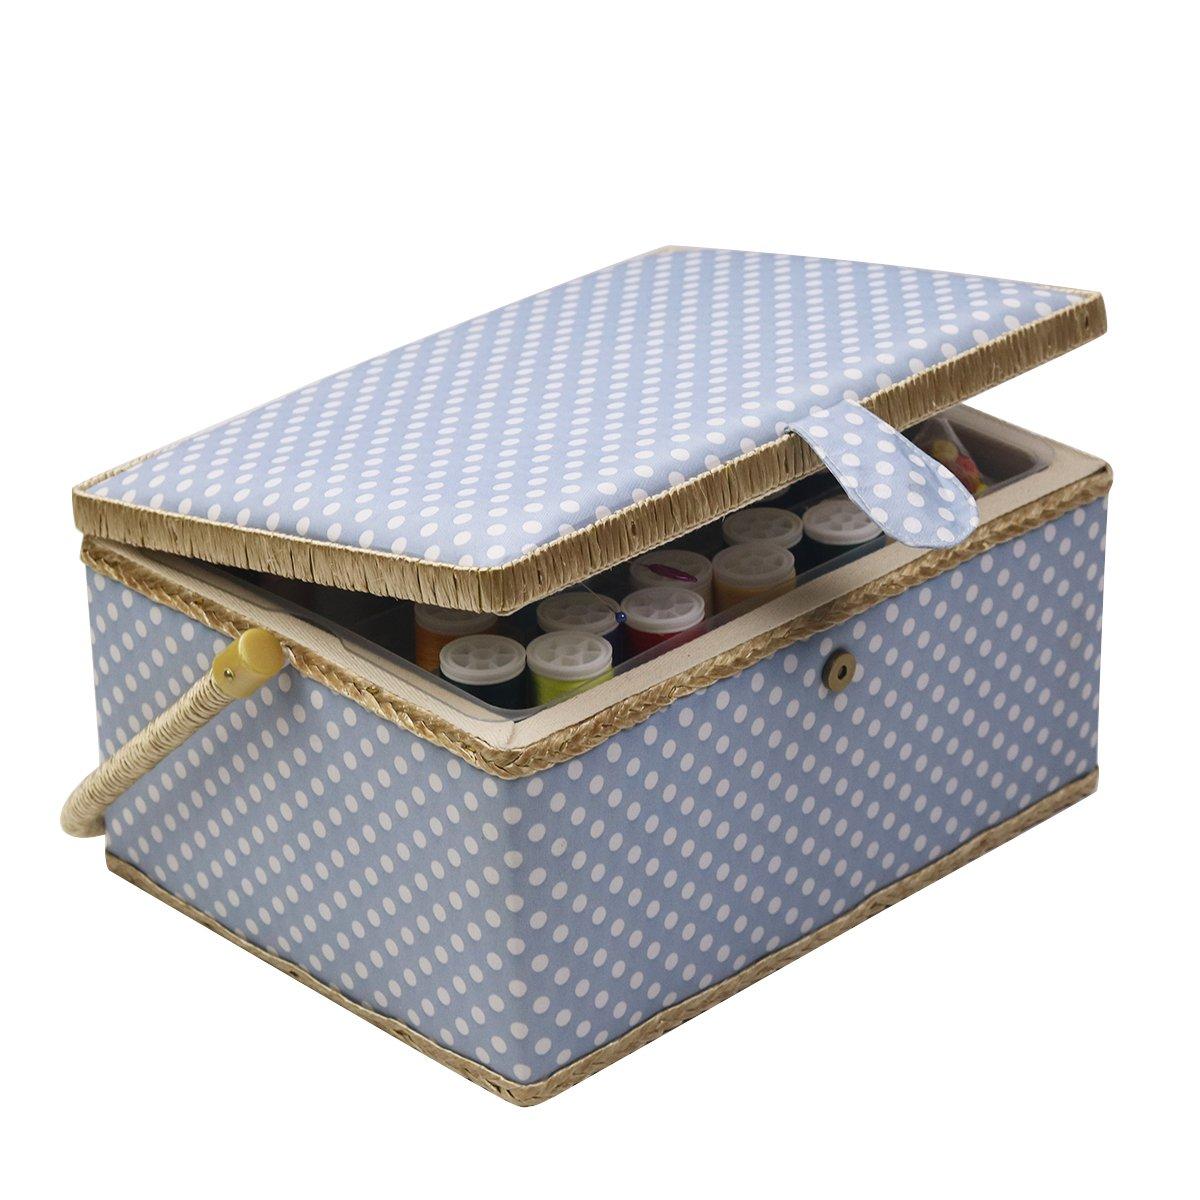 D&D Sewing Kit Basket for Storage & Organization - Yellow Polka Dot